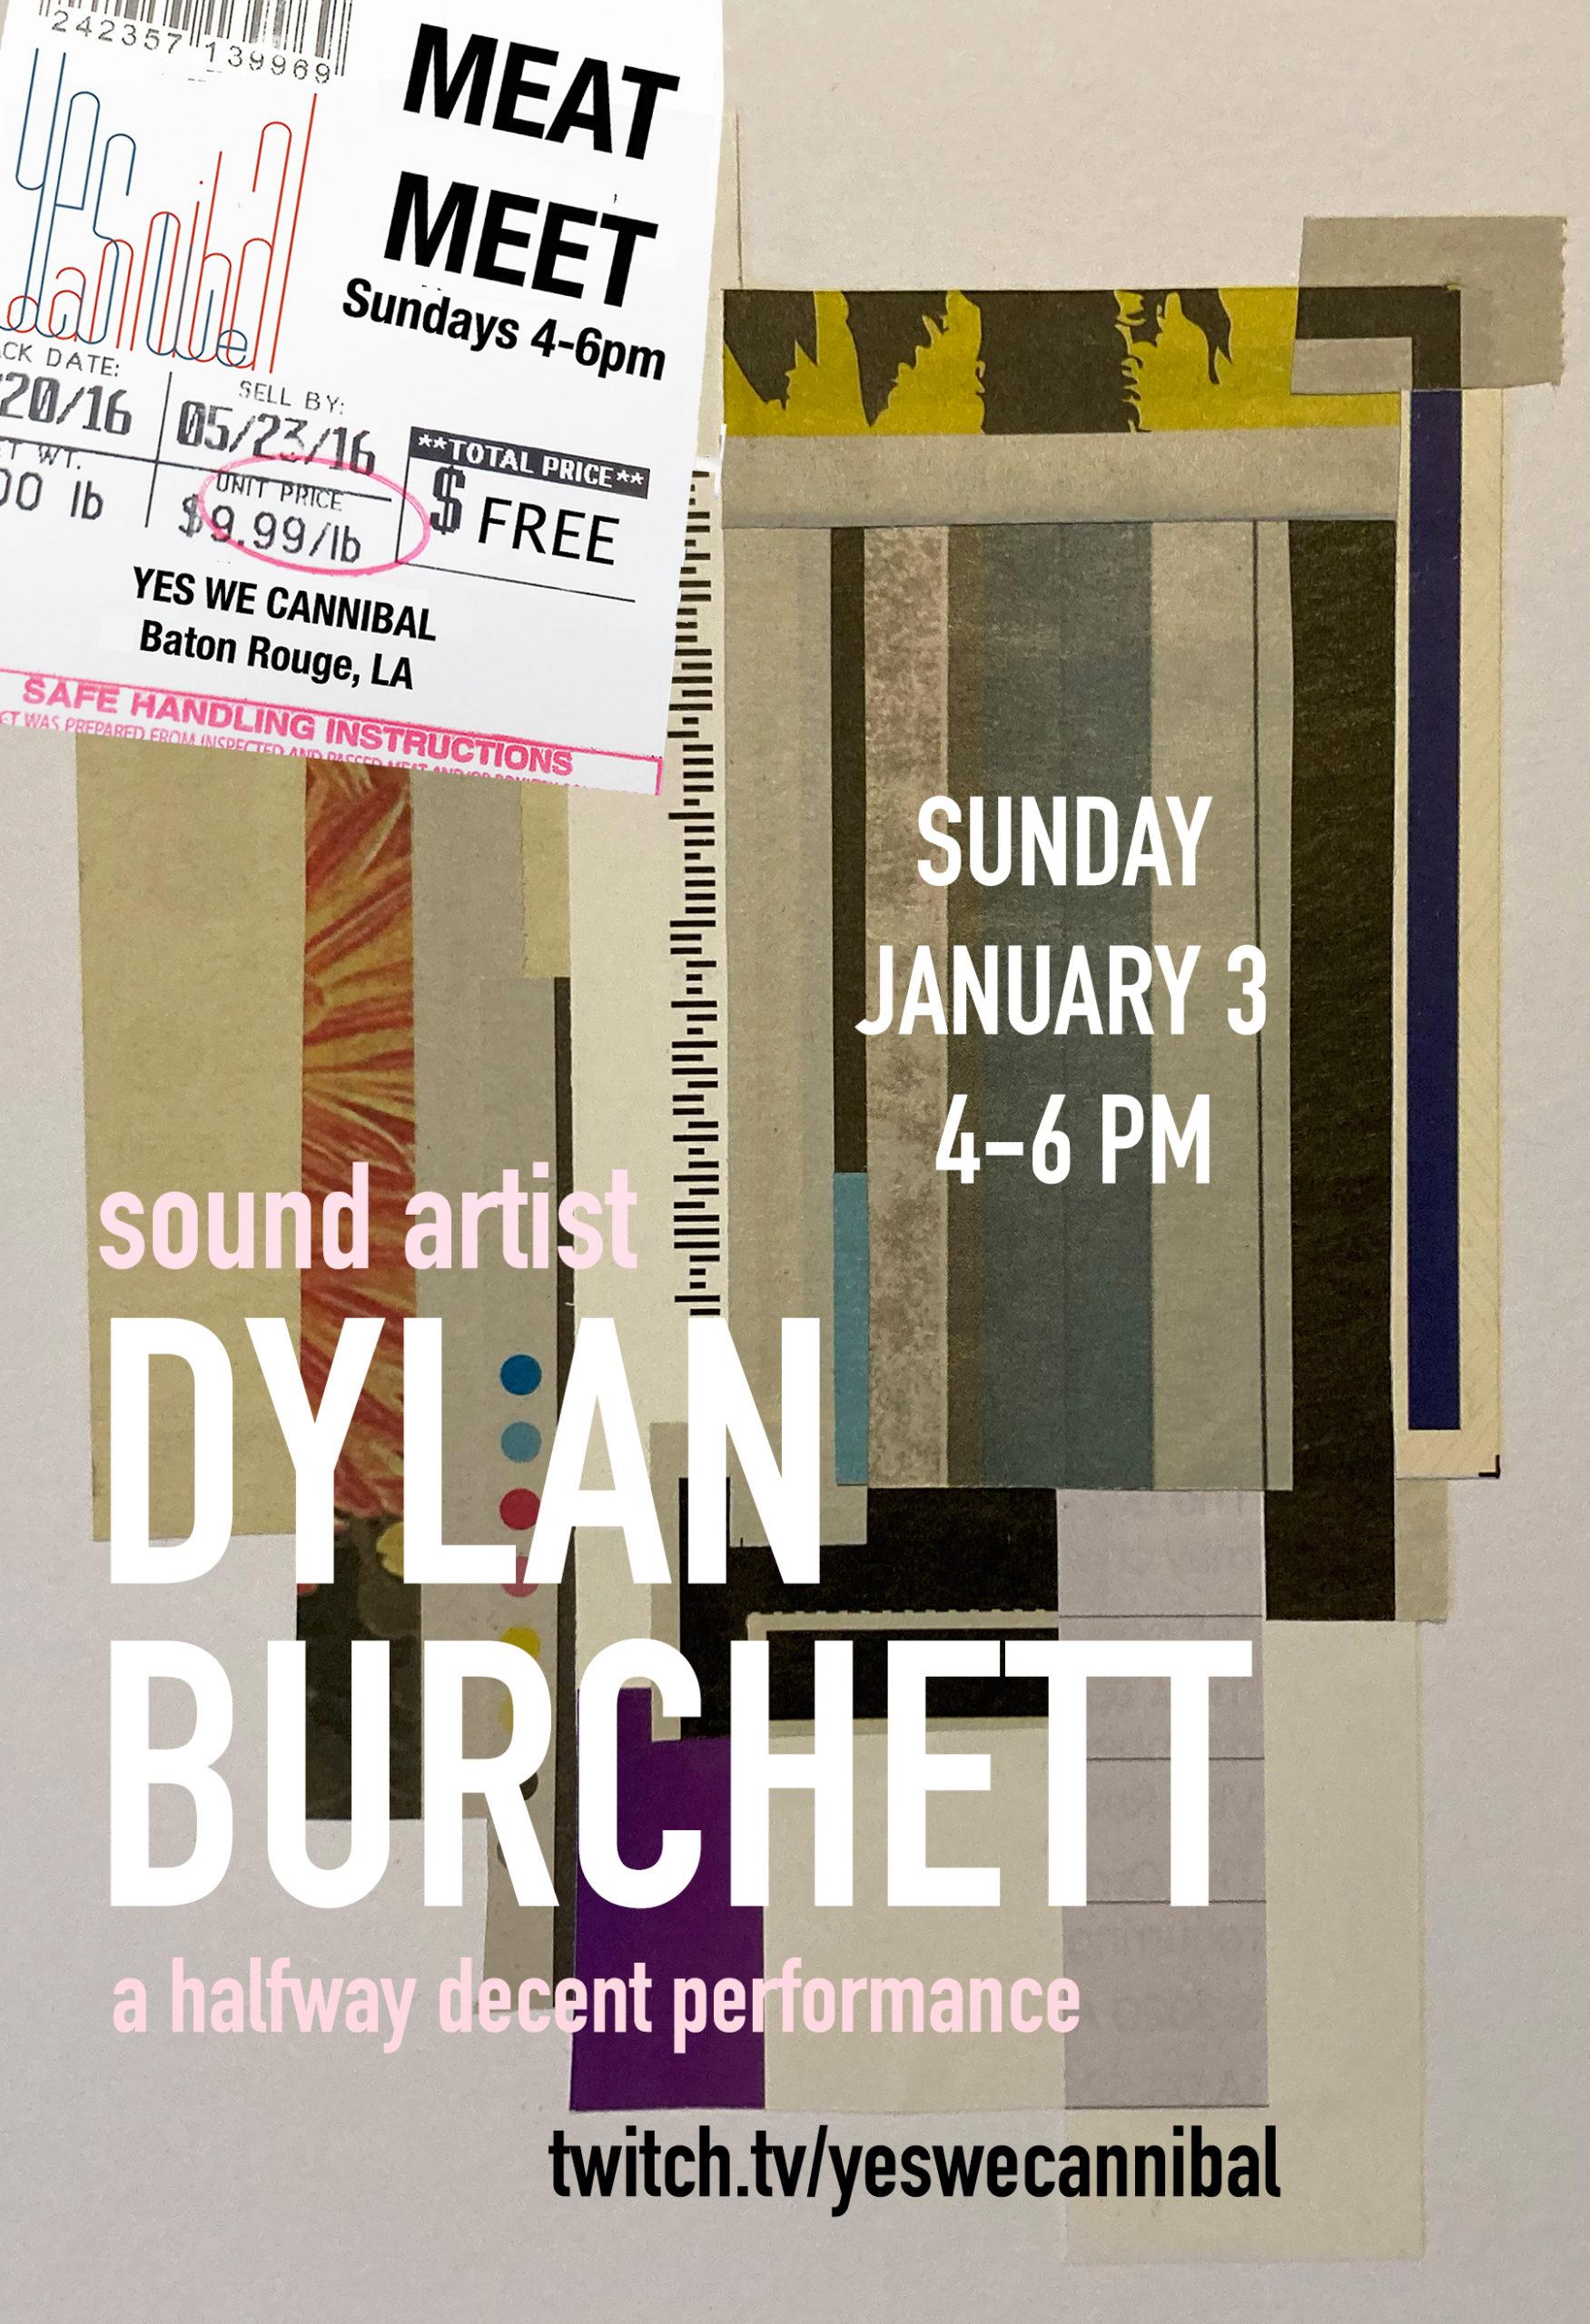 Dylan Burchett